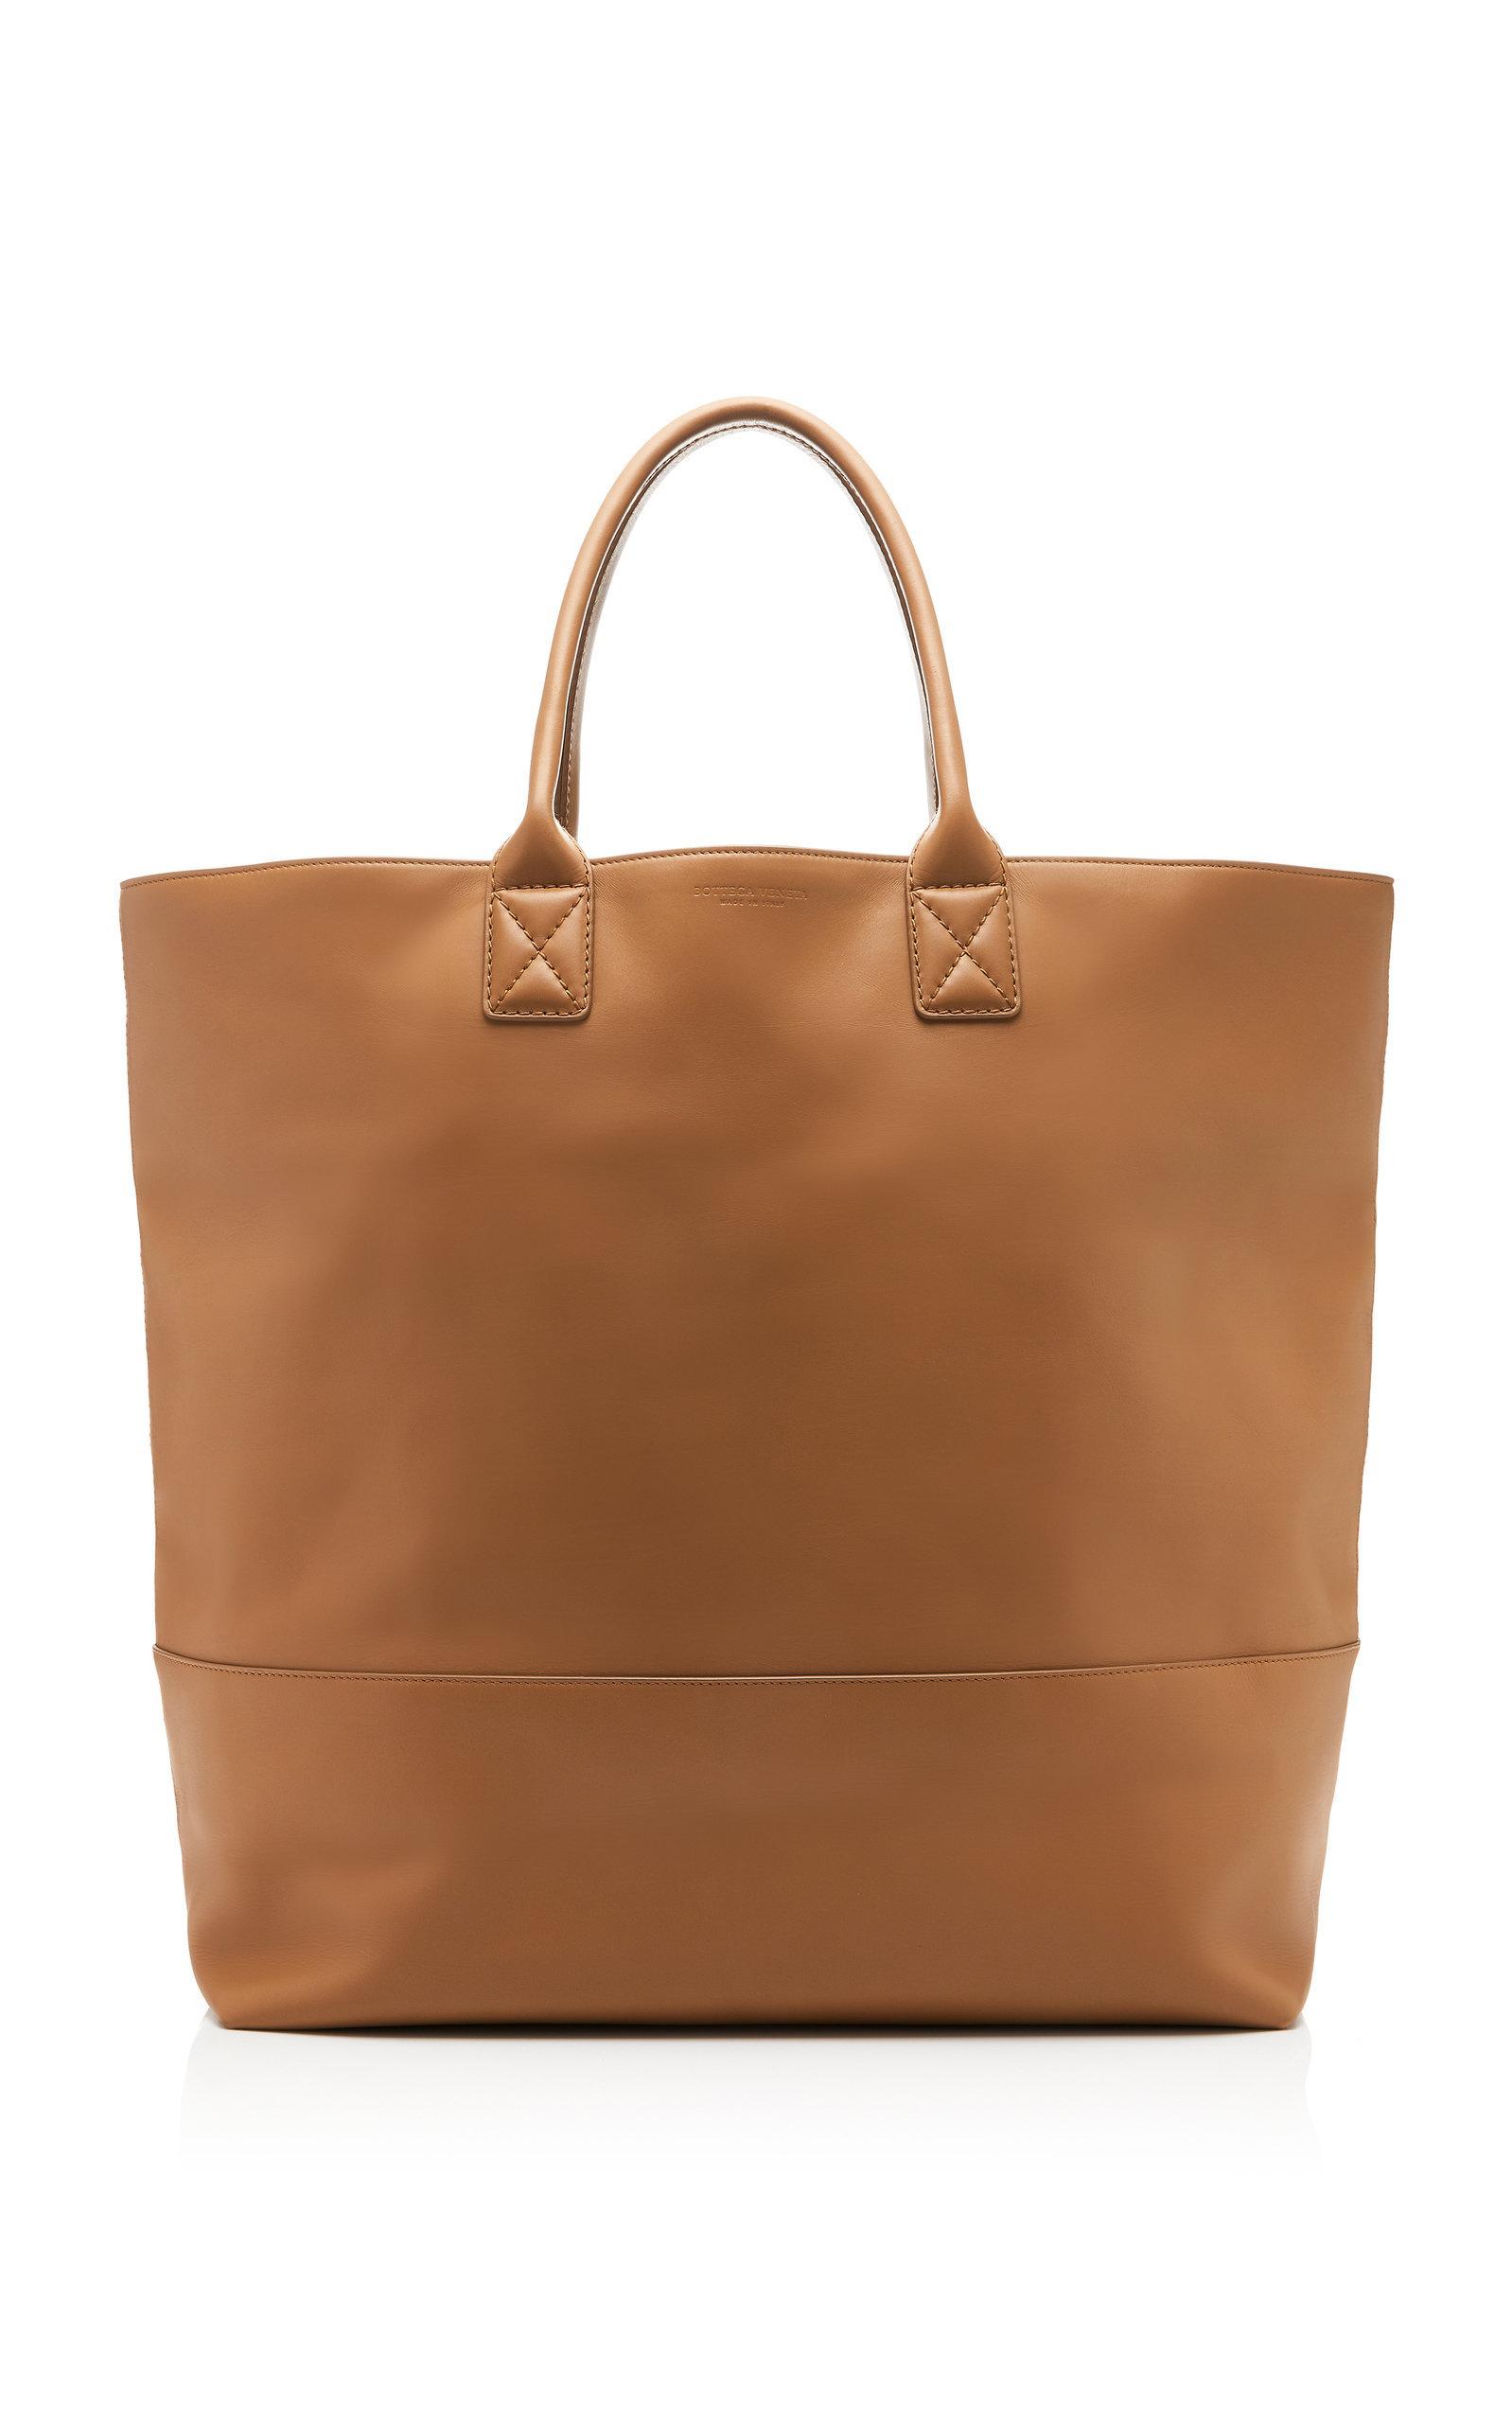 e1c5f7cb851d1 Bottega Veneta Cabat Oversized Leather Tote in Brown - Lyst